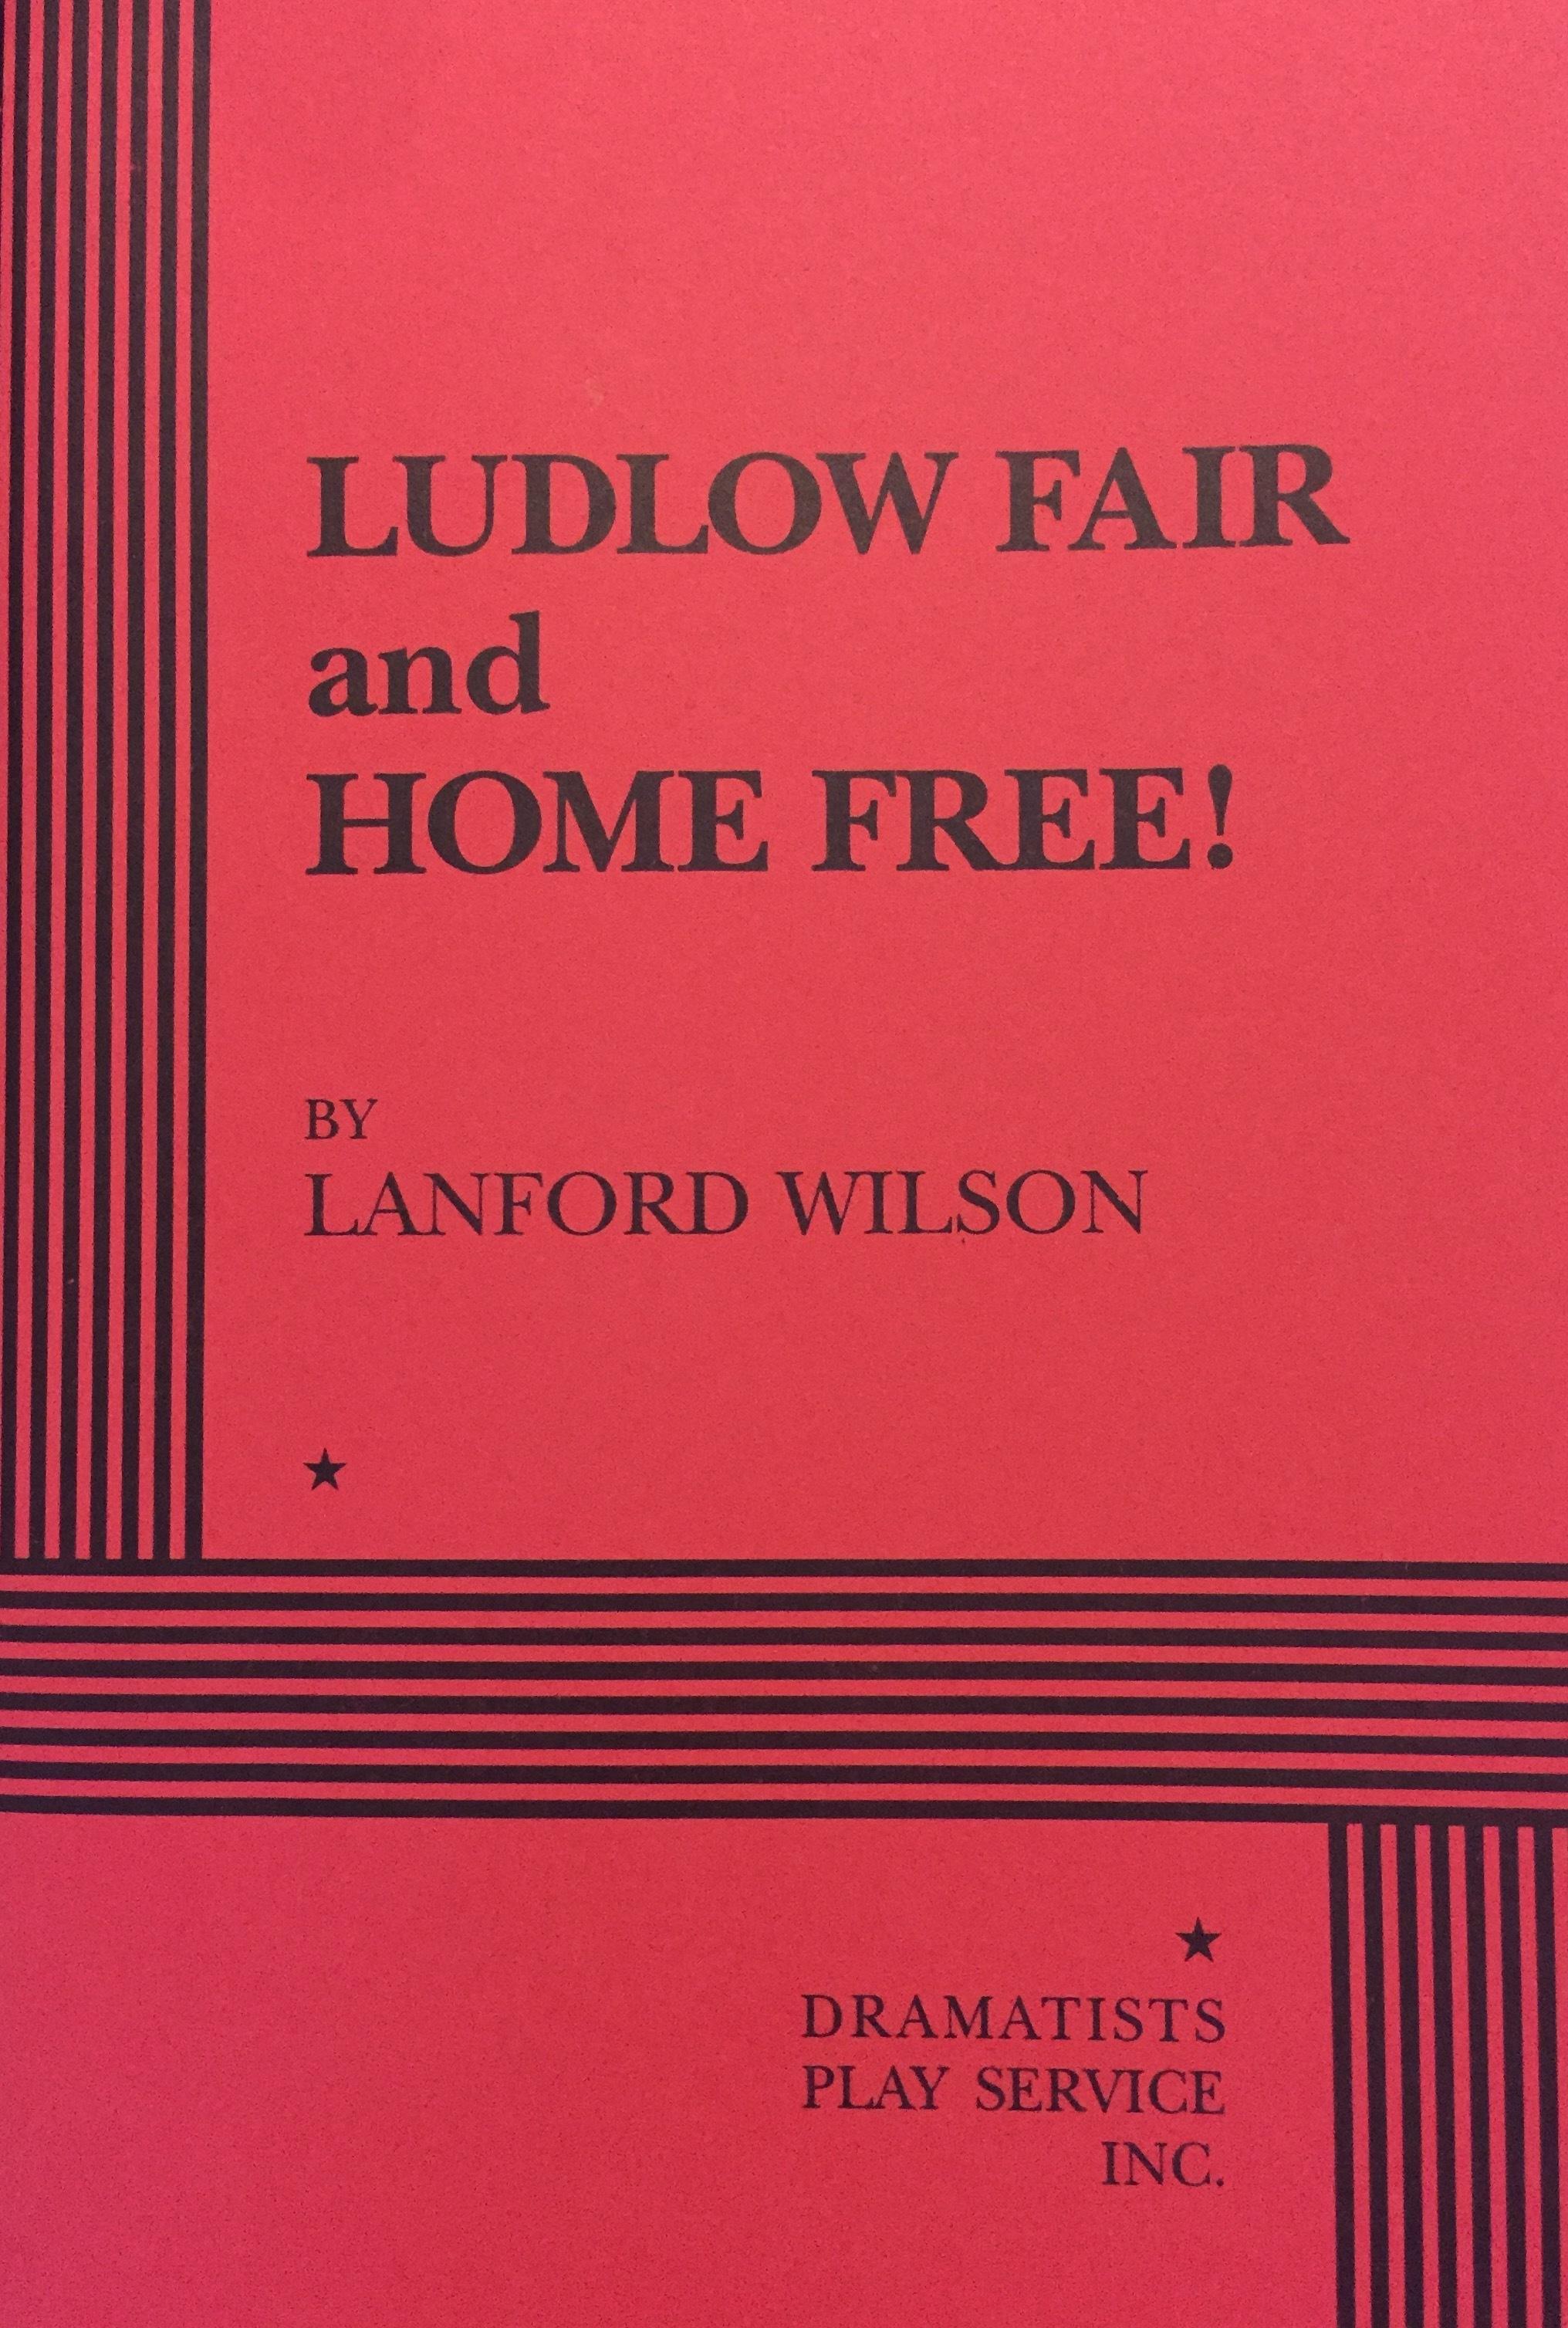 Ludlow Fair & Home Free